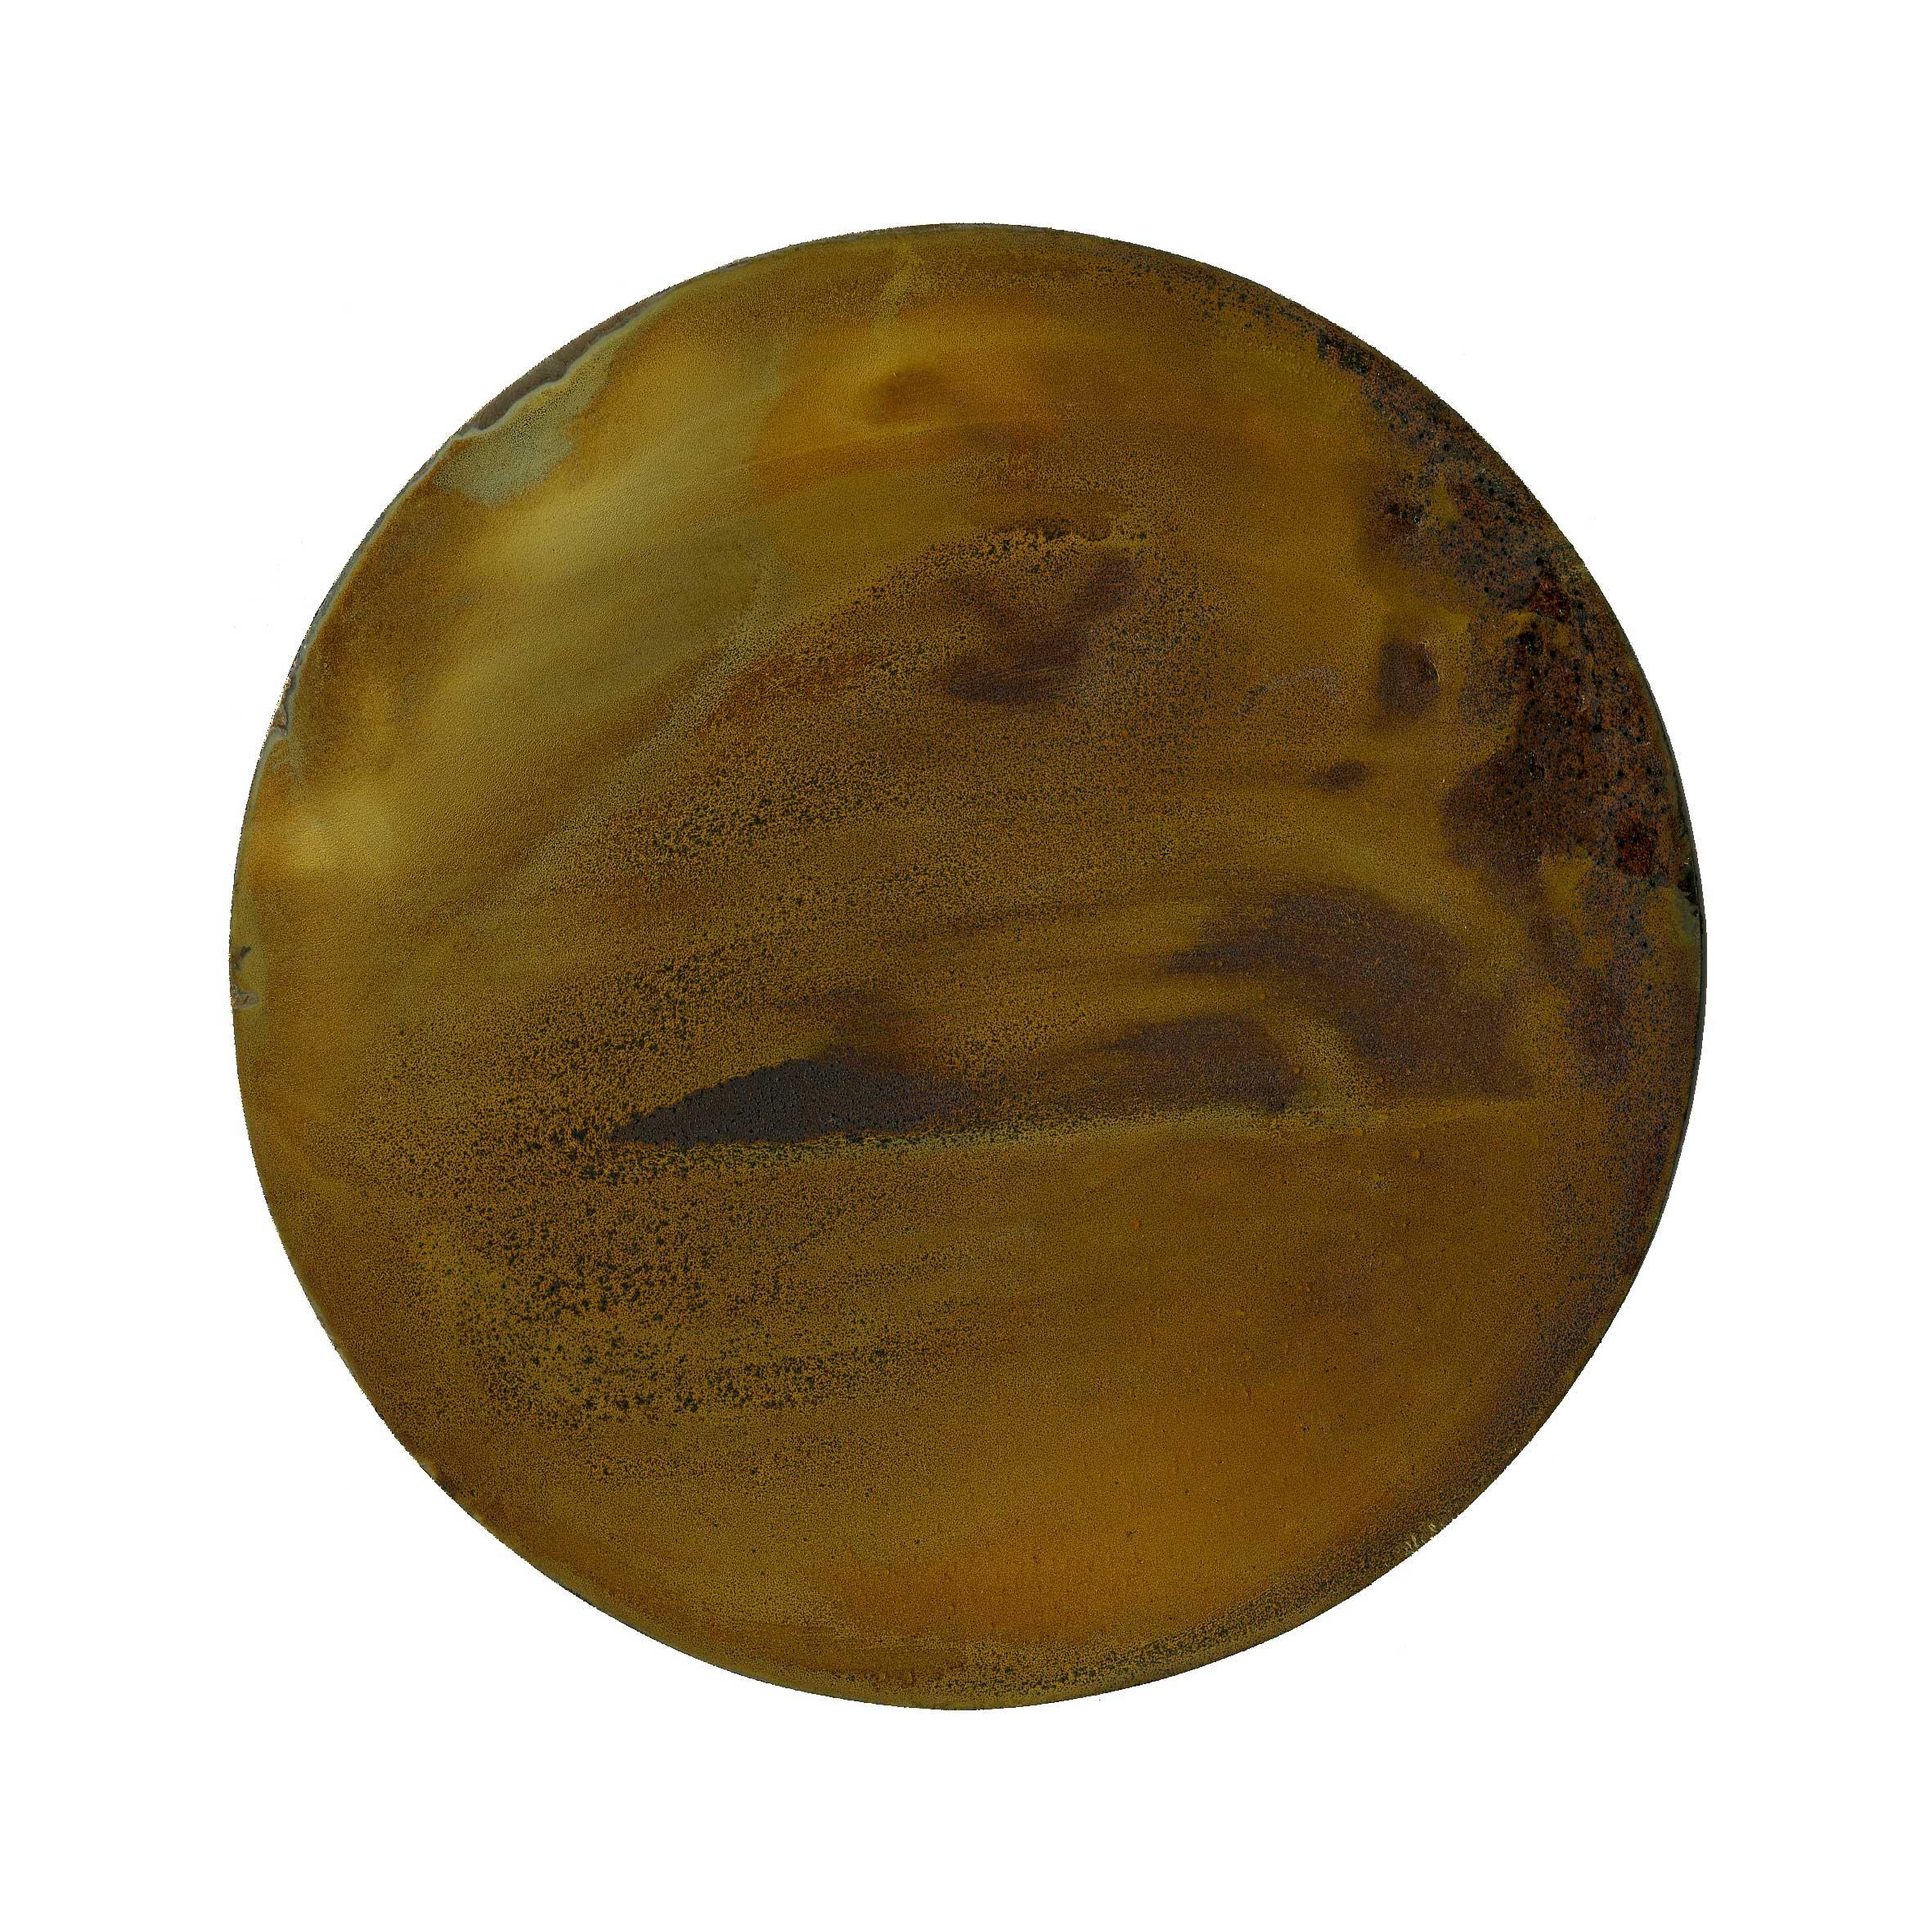 IRON AND TIME (VI) 2010  oxidised iron disc  Ø 120 mm